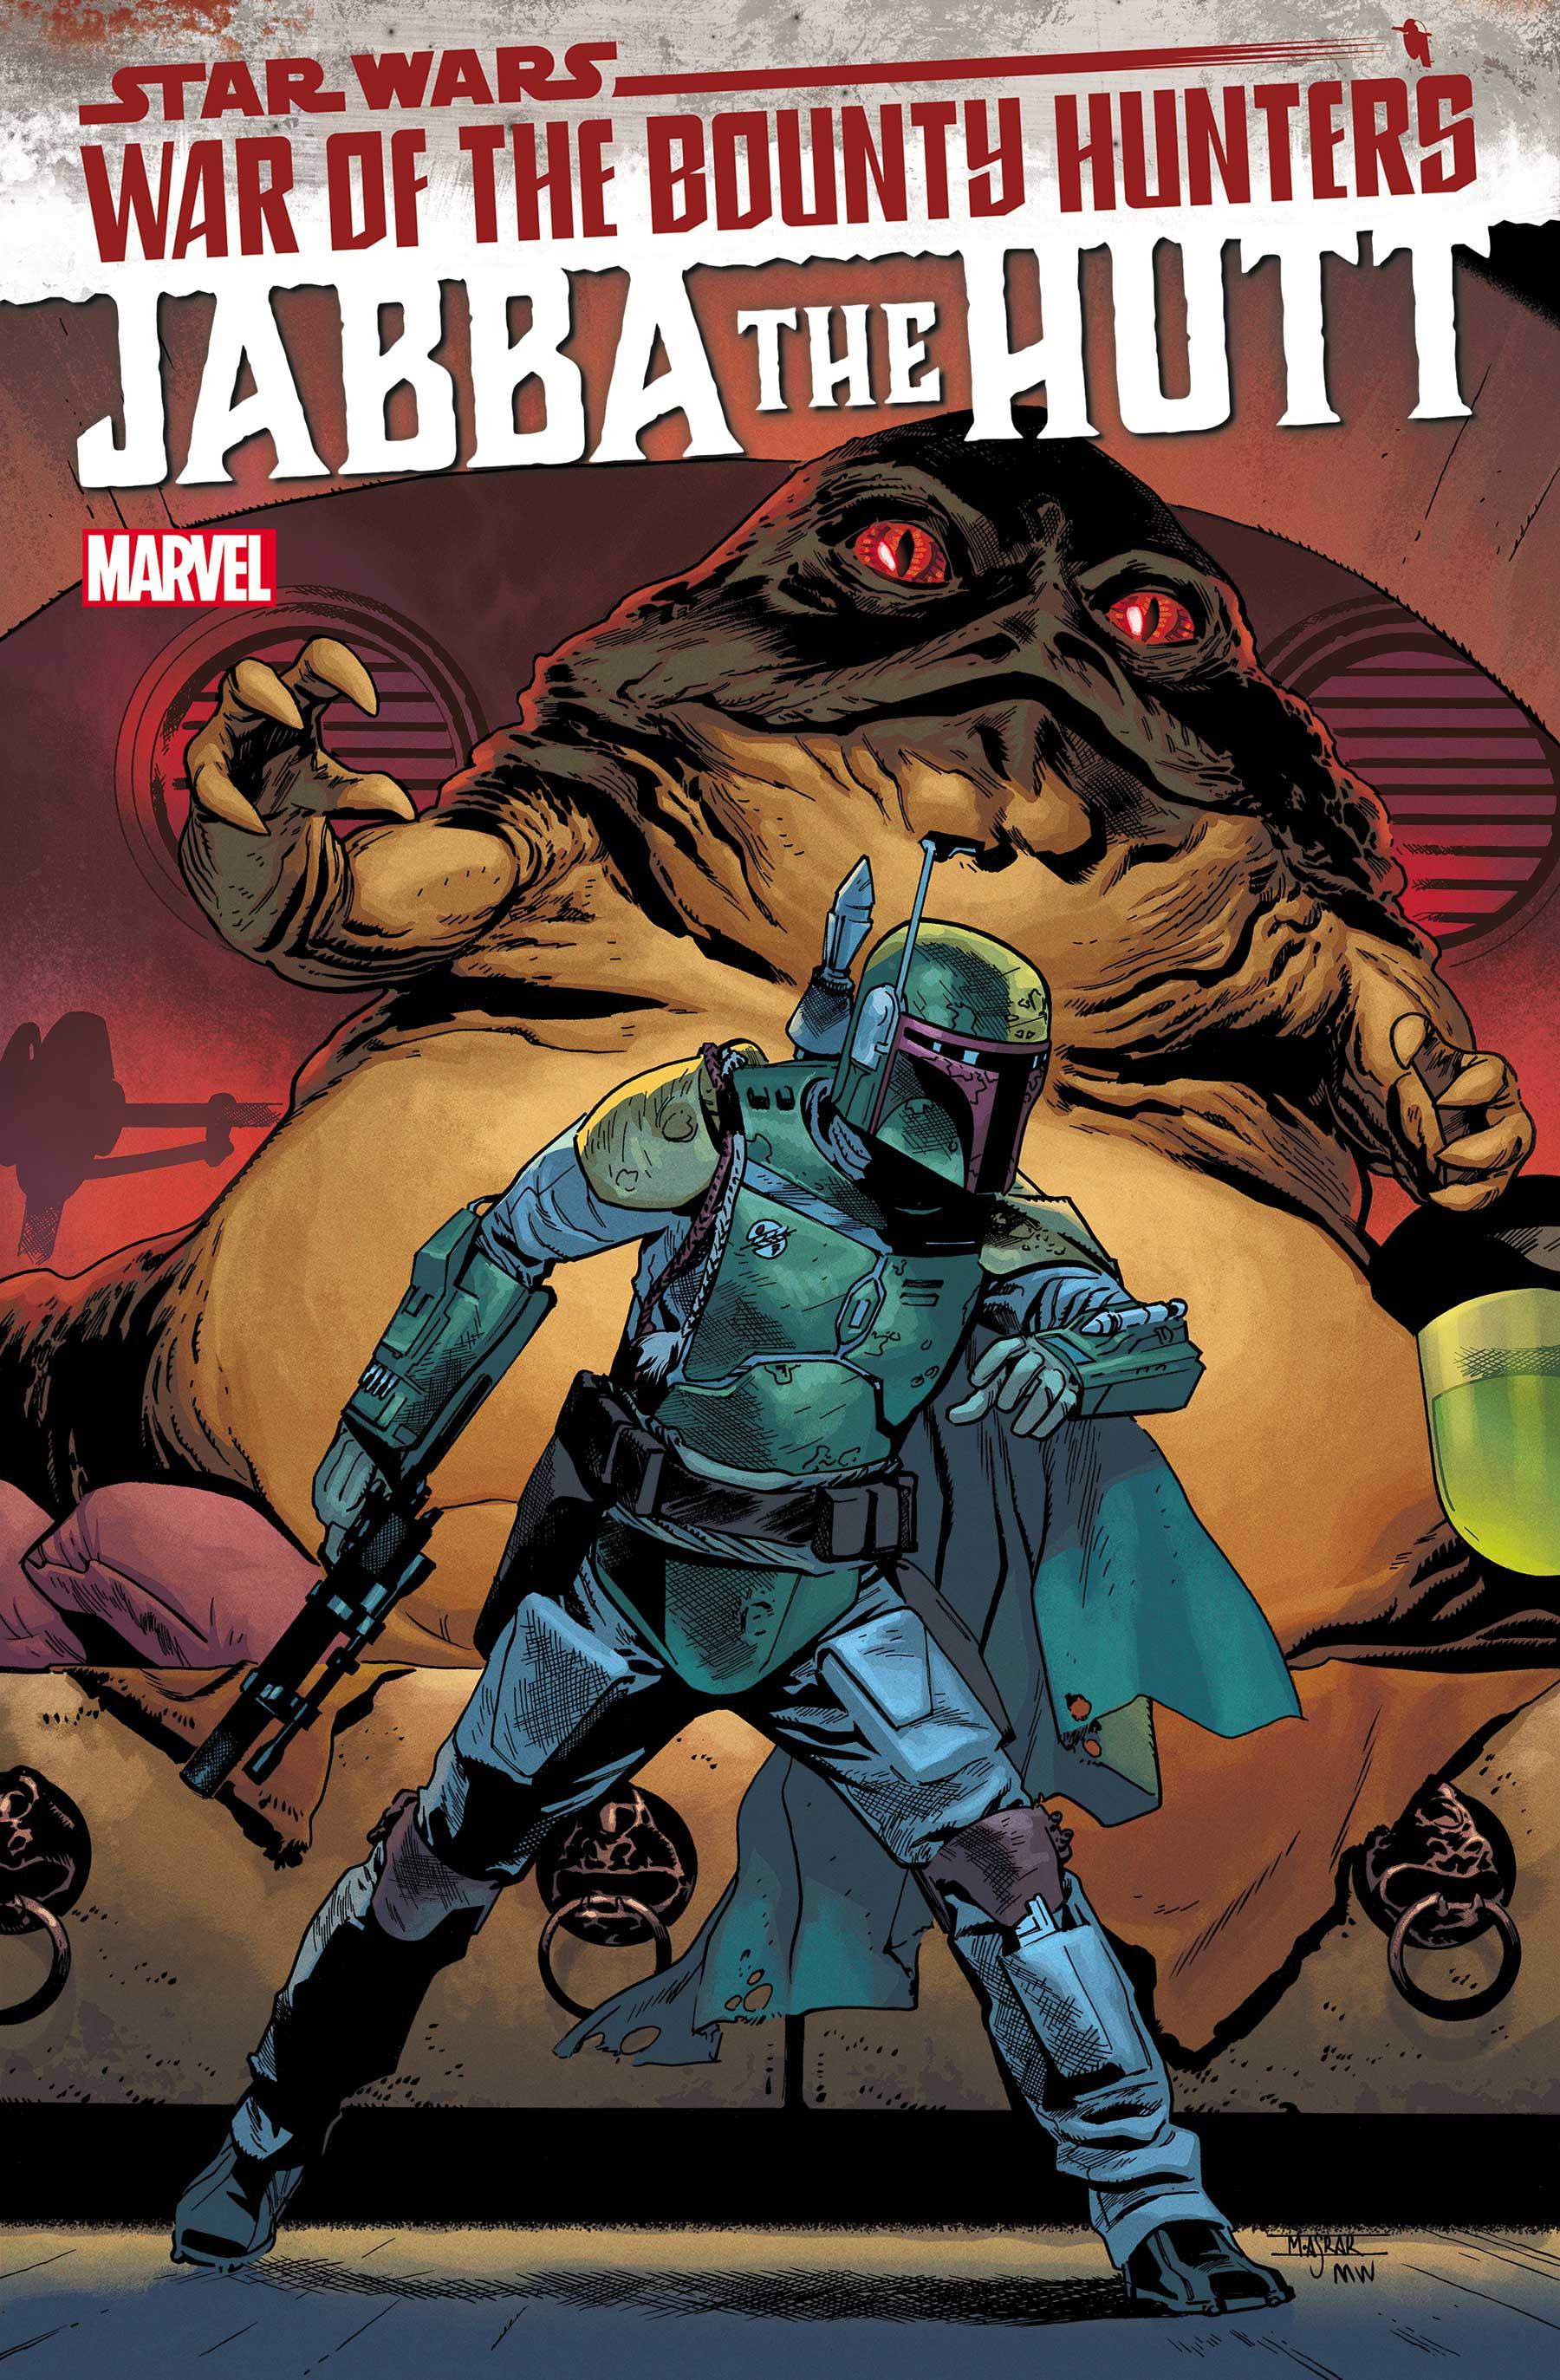 STAR WARS: WAR OF THE BOUNTY HUNTERS - JABBA THE HUTT 1 (2021) #1